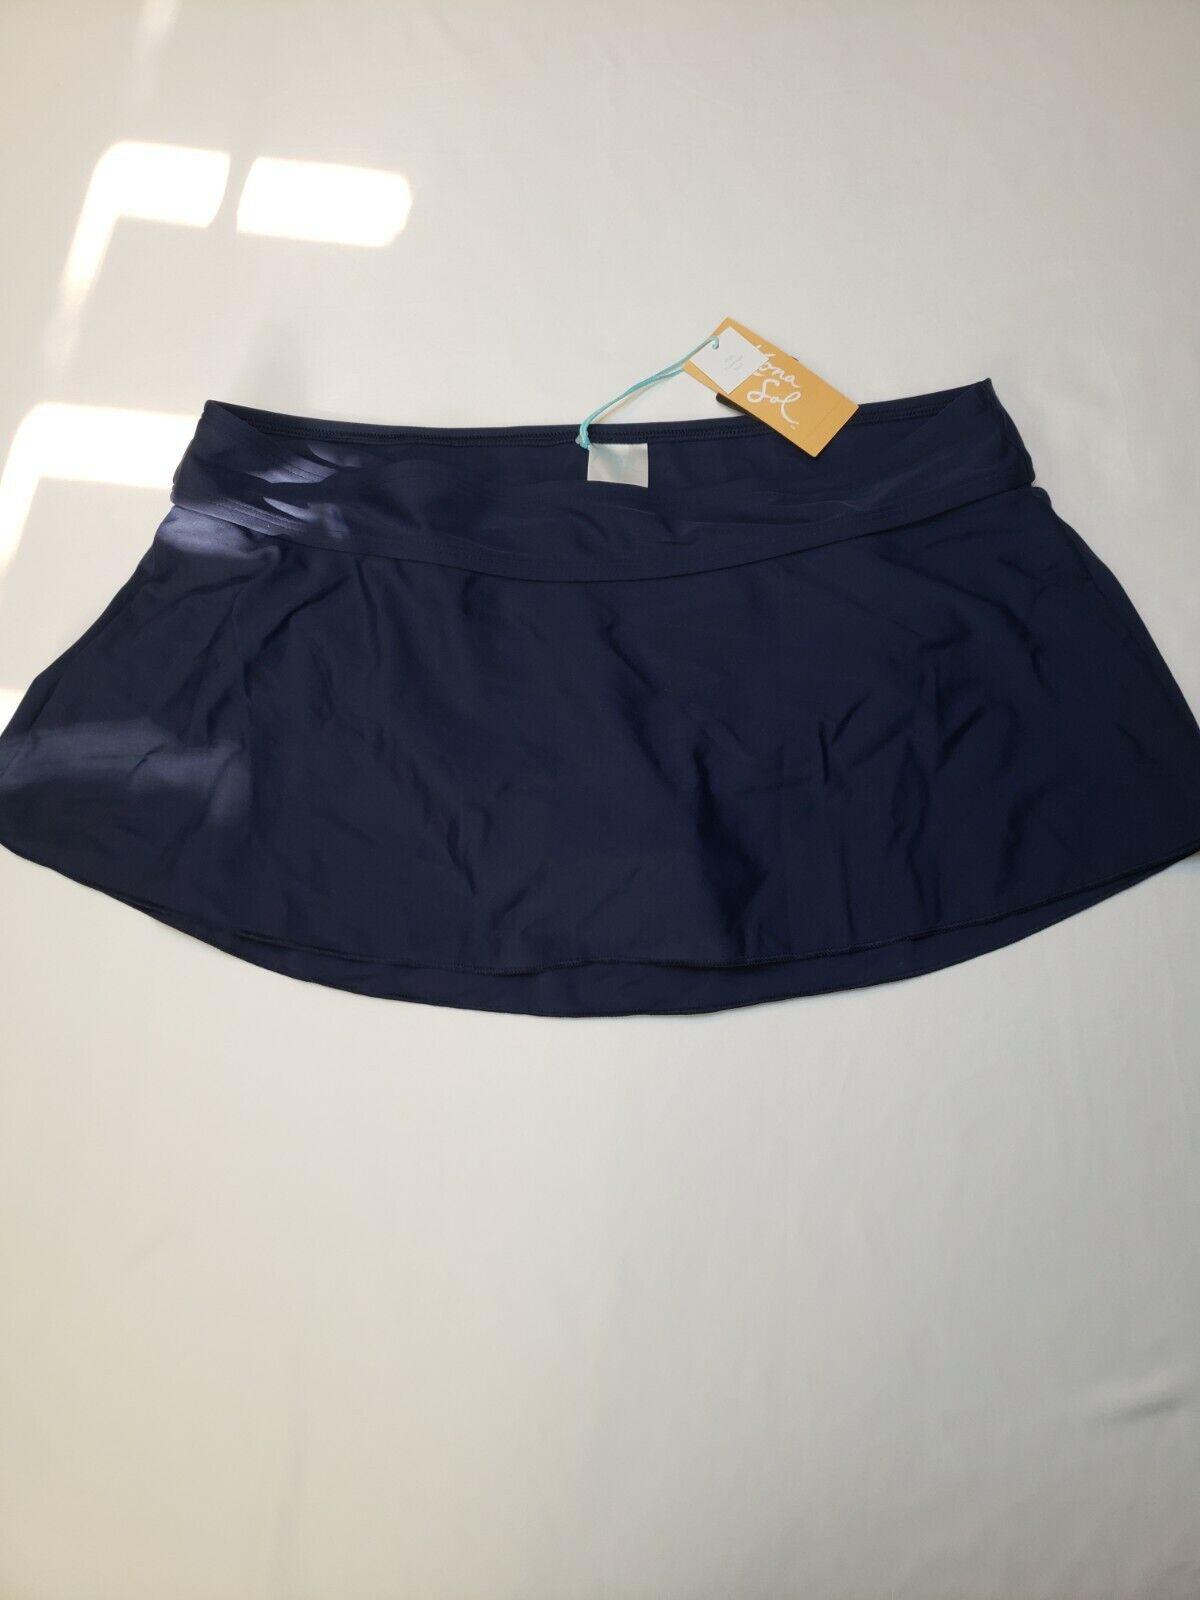 Kona Sol Navy Blue High Coverage Swim Skirt Size L Built In Liner Comfortable - $13.99